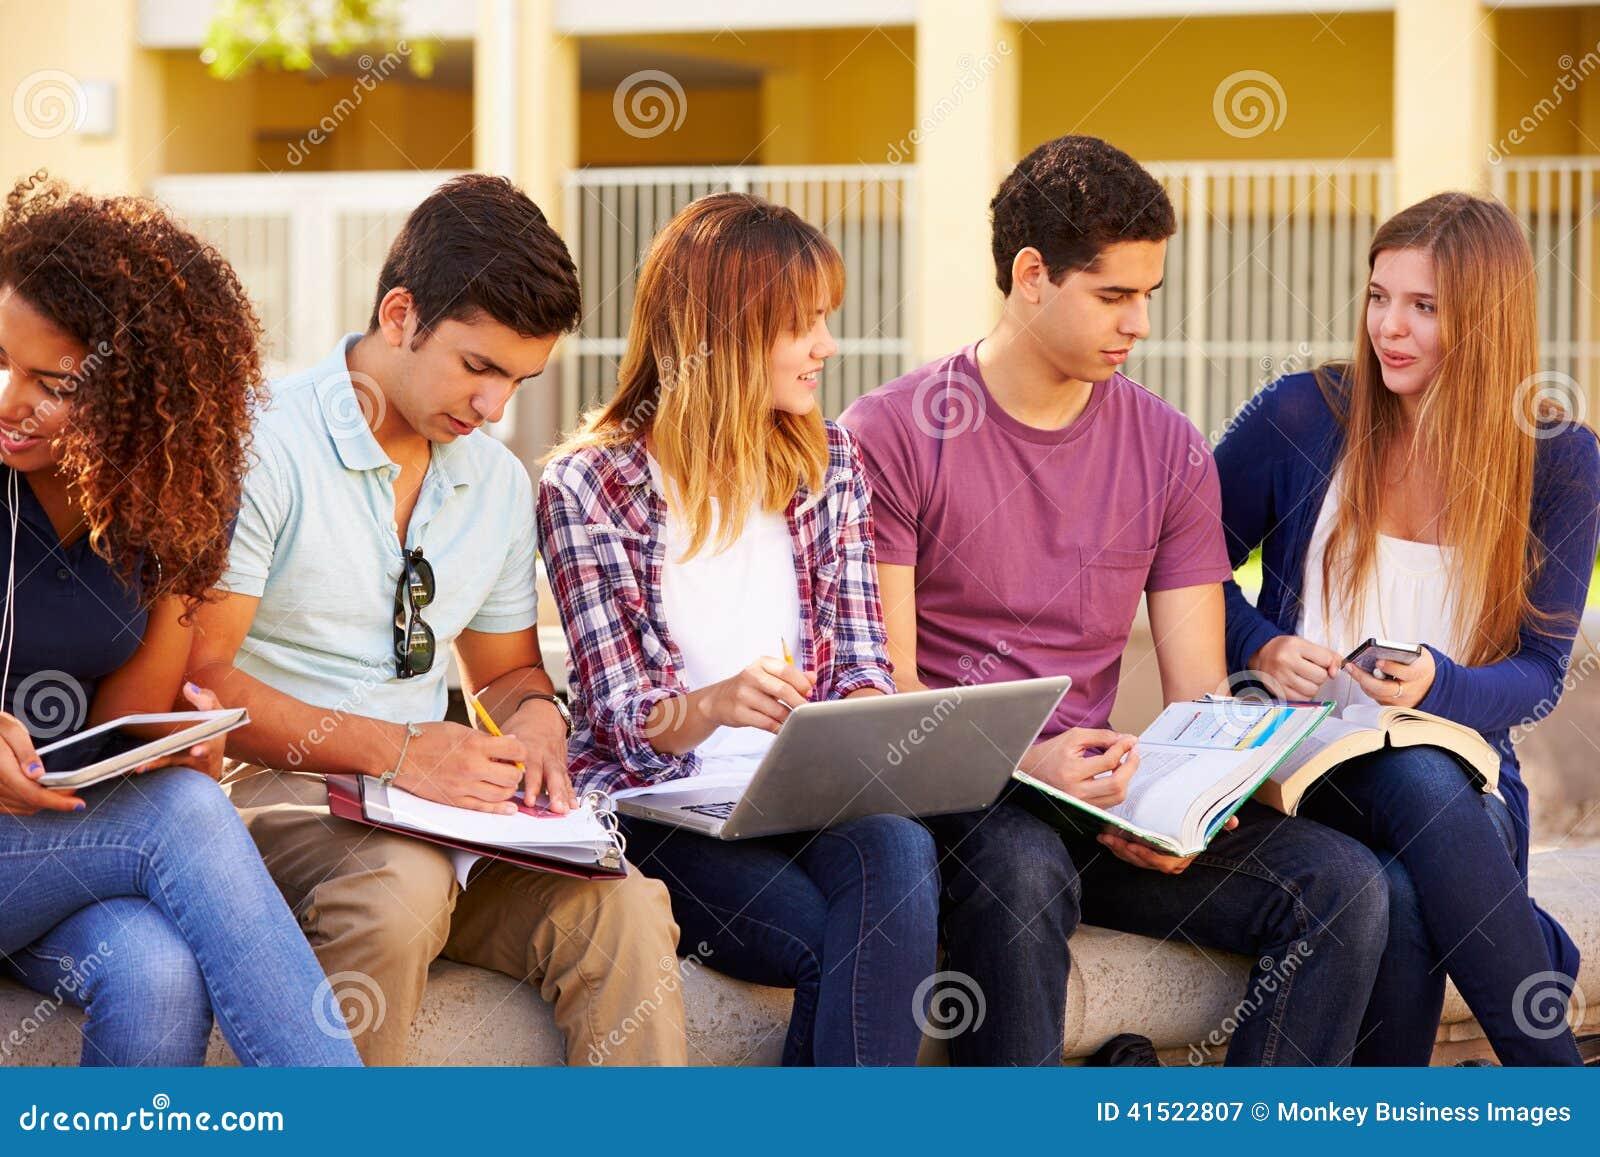 High School Web Design Technology Textbooks